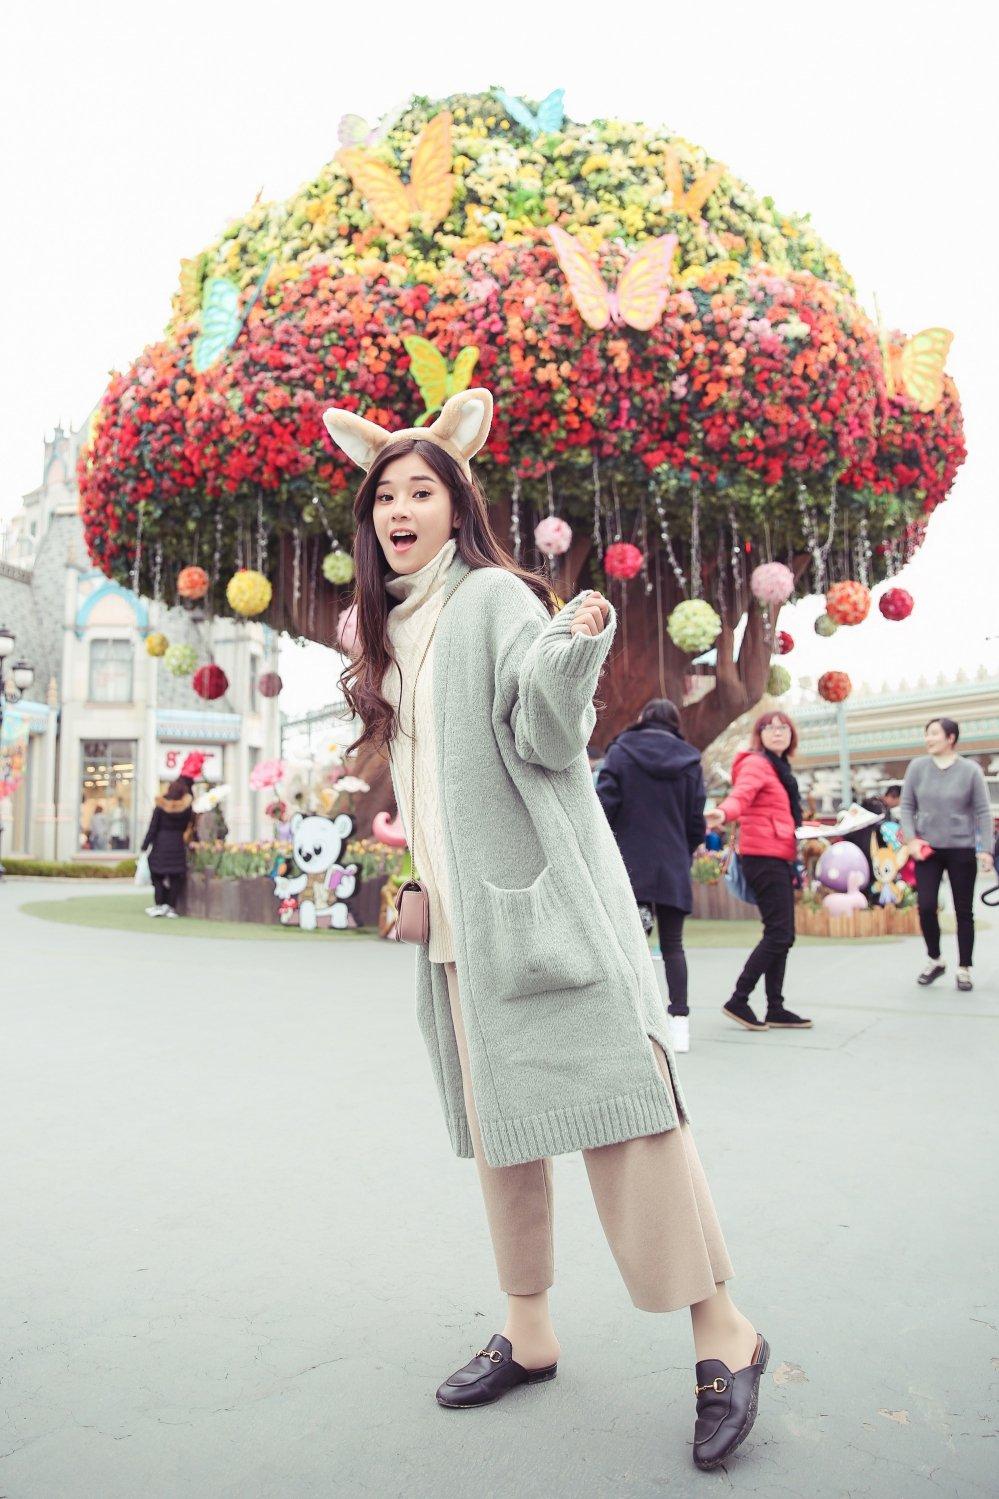 Hoang Yen Chibi tu lam stylist, khoe nhan sac trong veo tai Han Quoc hinh anh 4